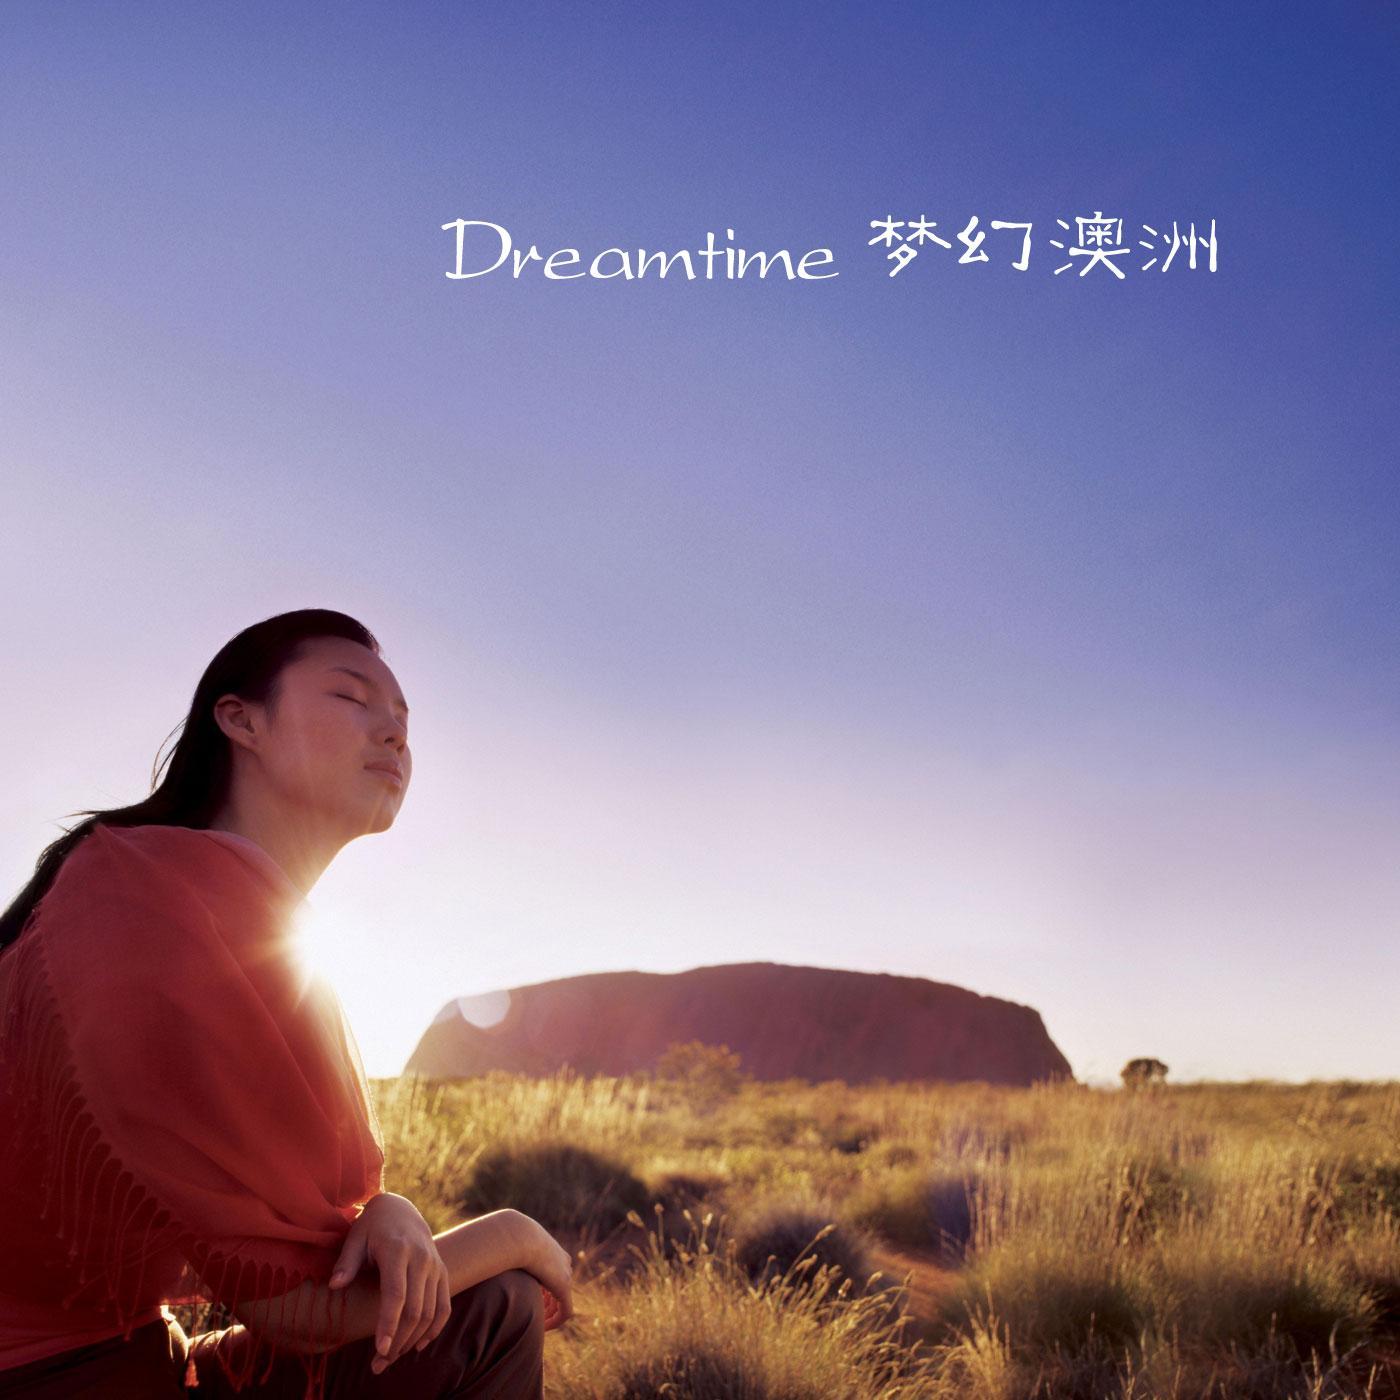 <![CDATA[Dreamtime梦幻澳洲]]>